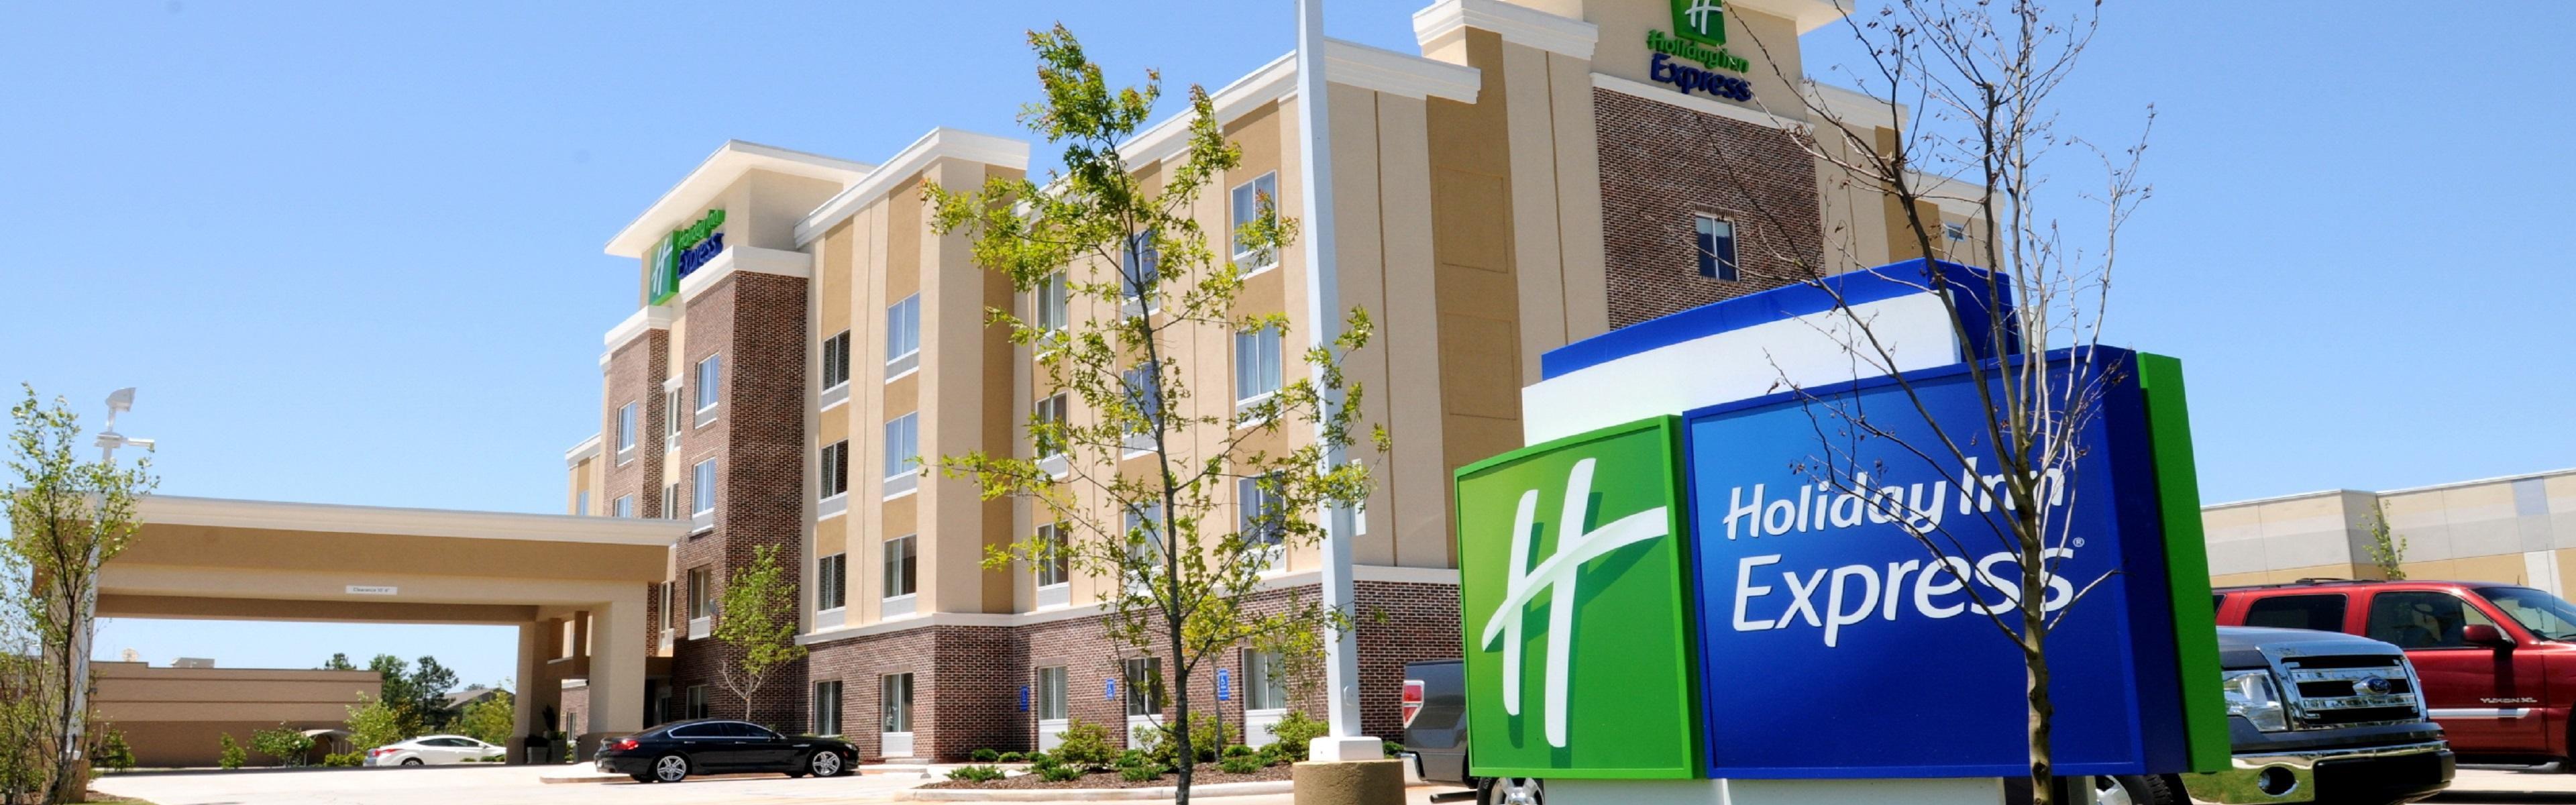 Holiday Inn Express Covington-Madisonville image 0